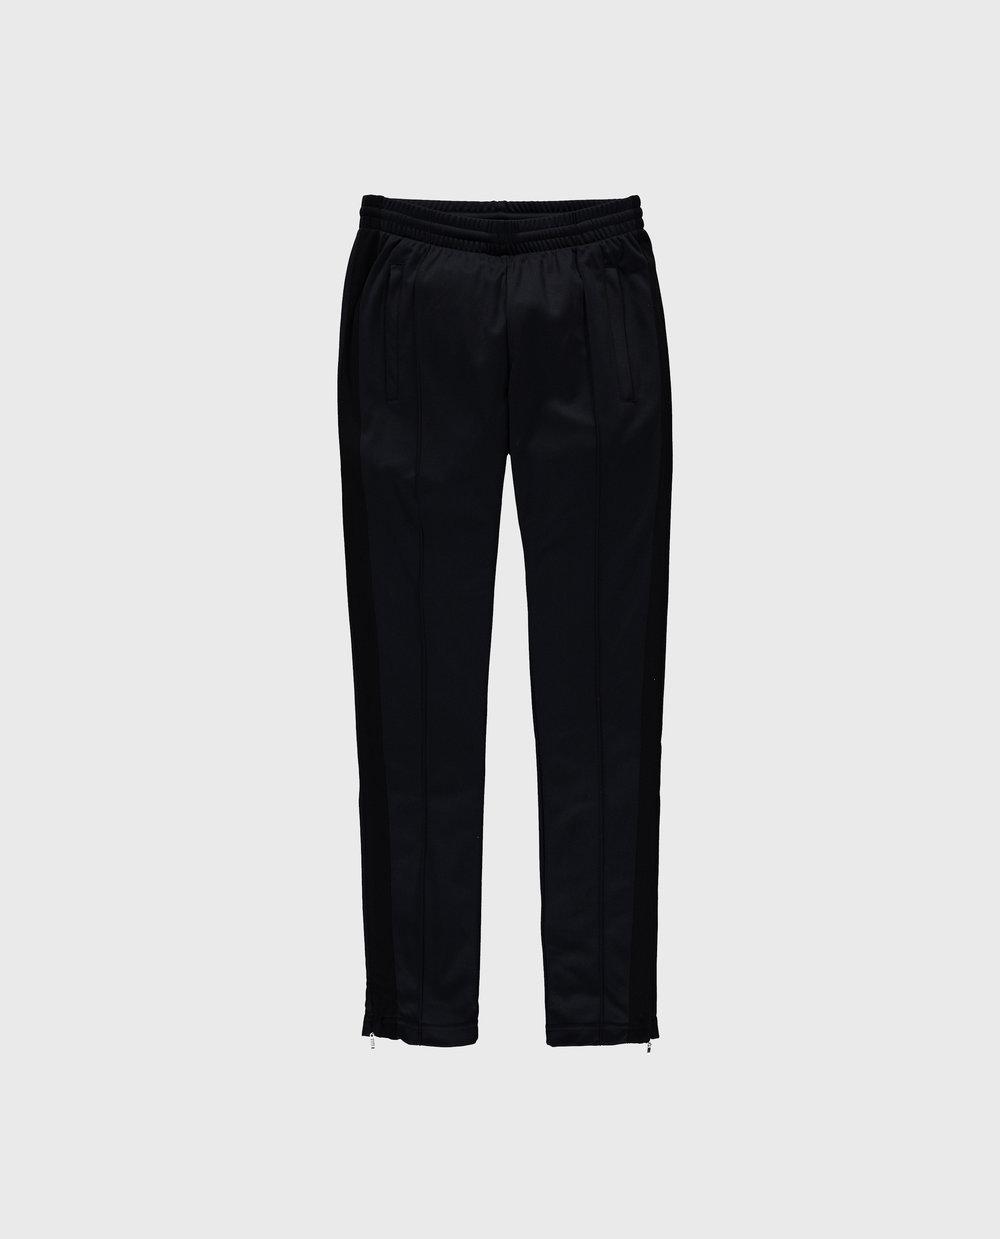 Track Pants - Navy/Black